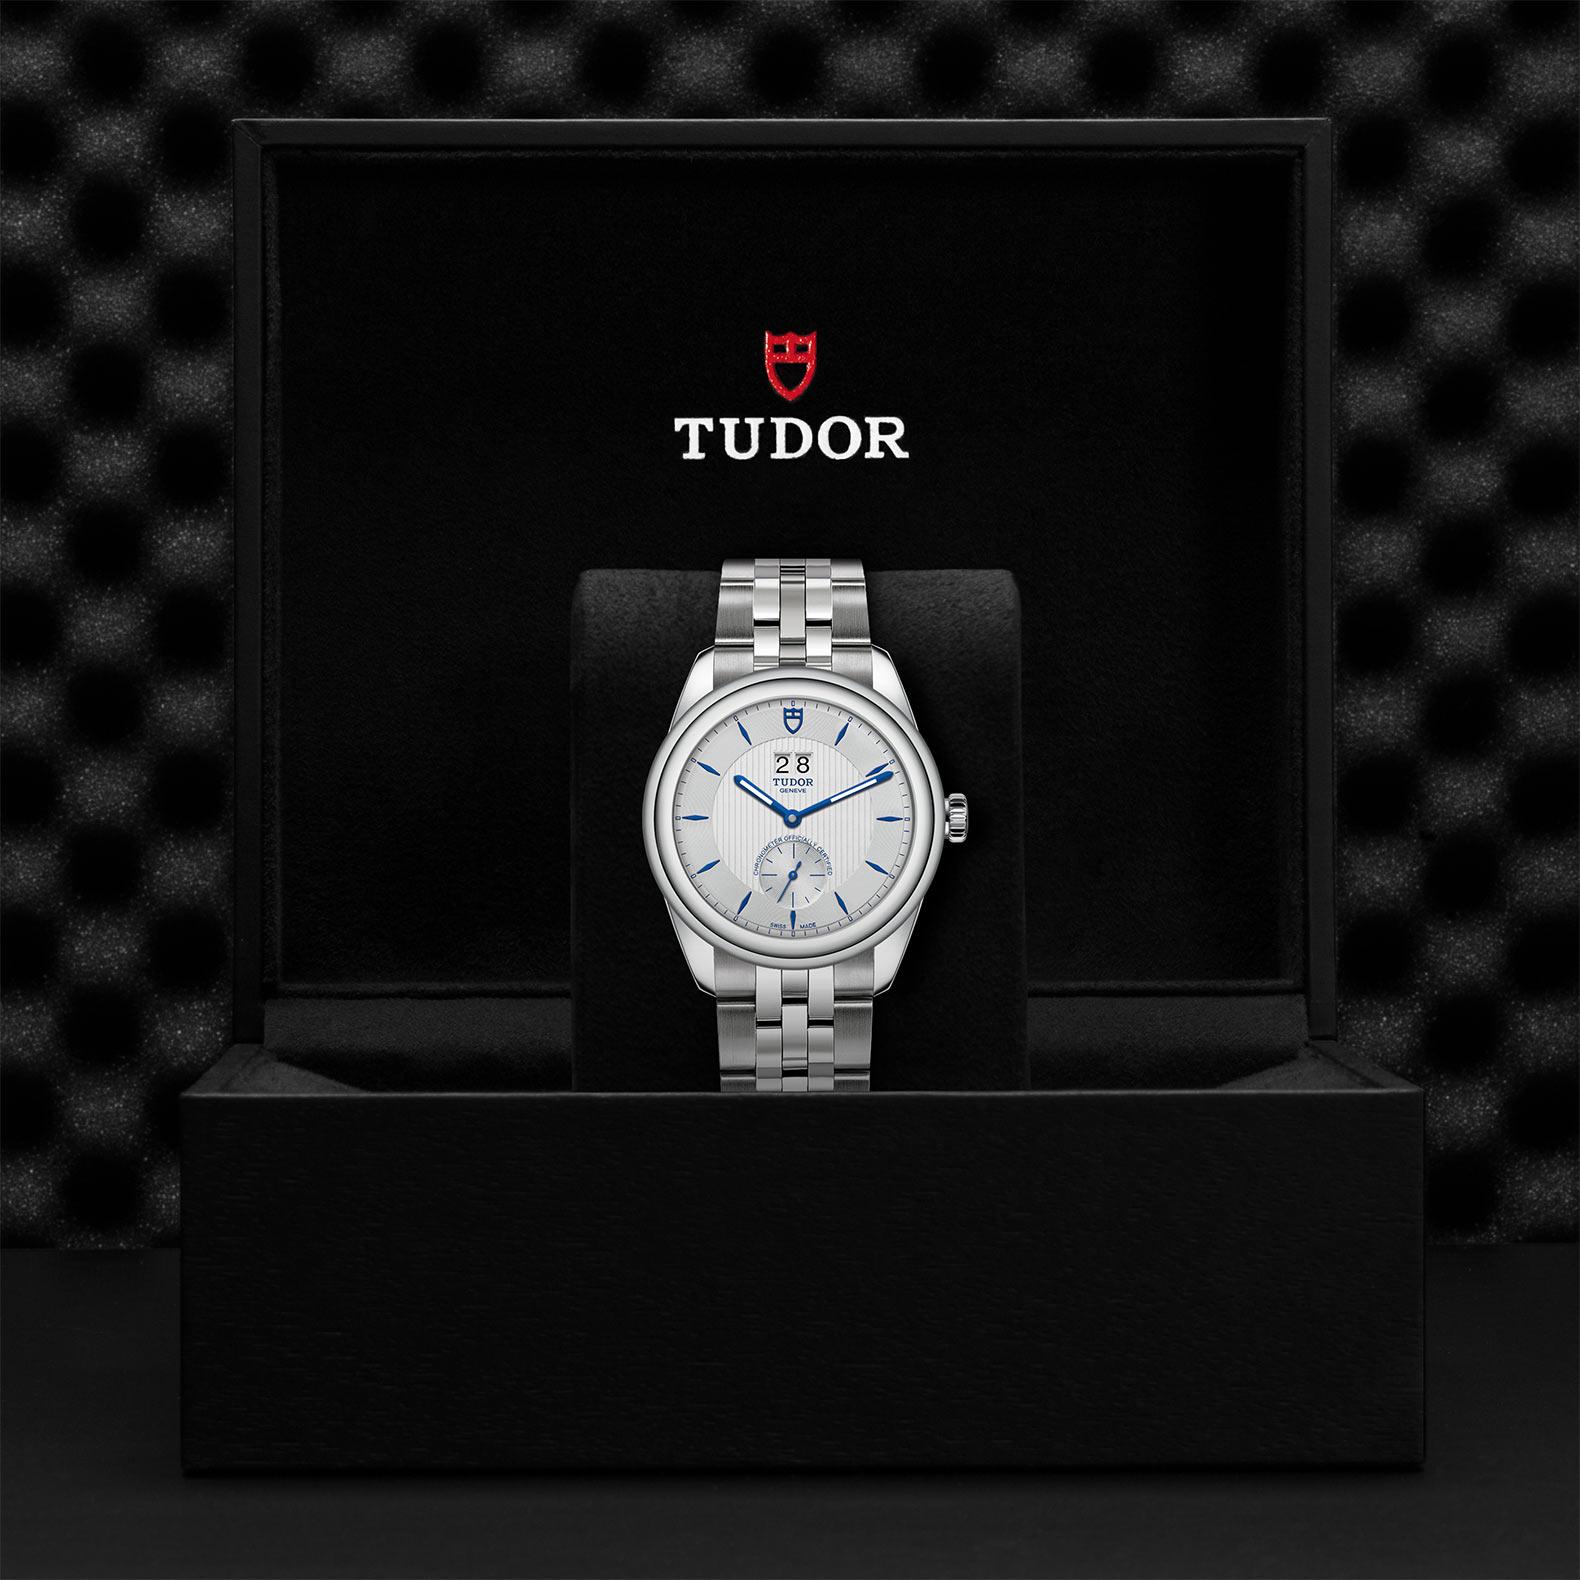 TUDOR Glamour Double Date - M57100-0001